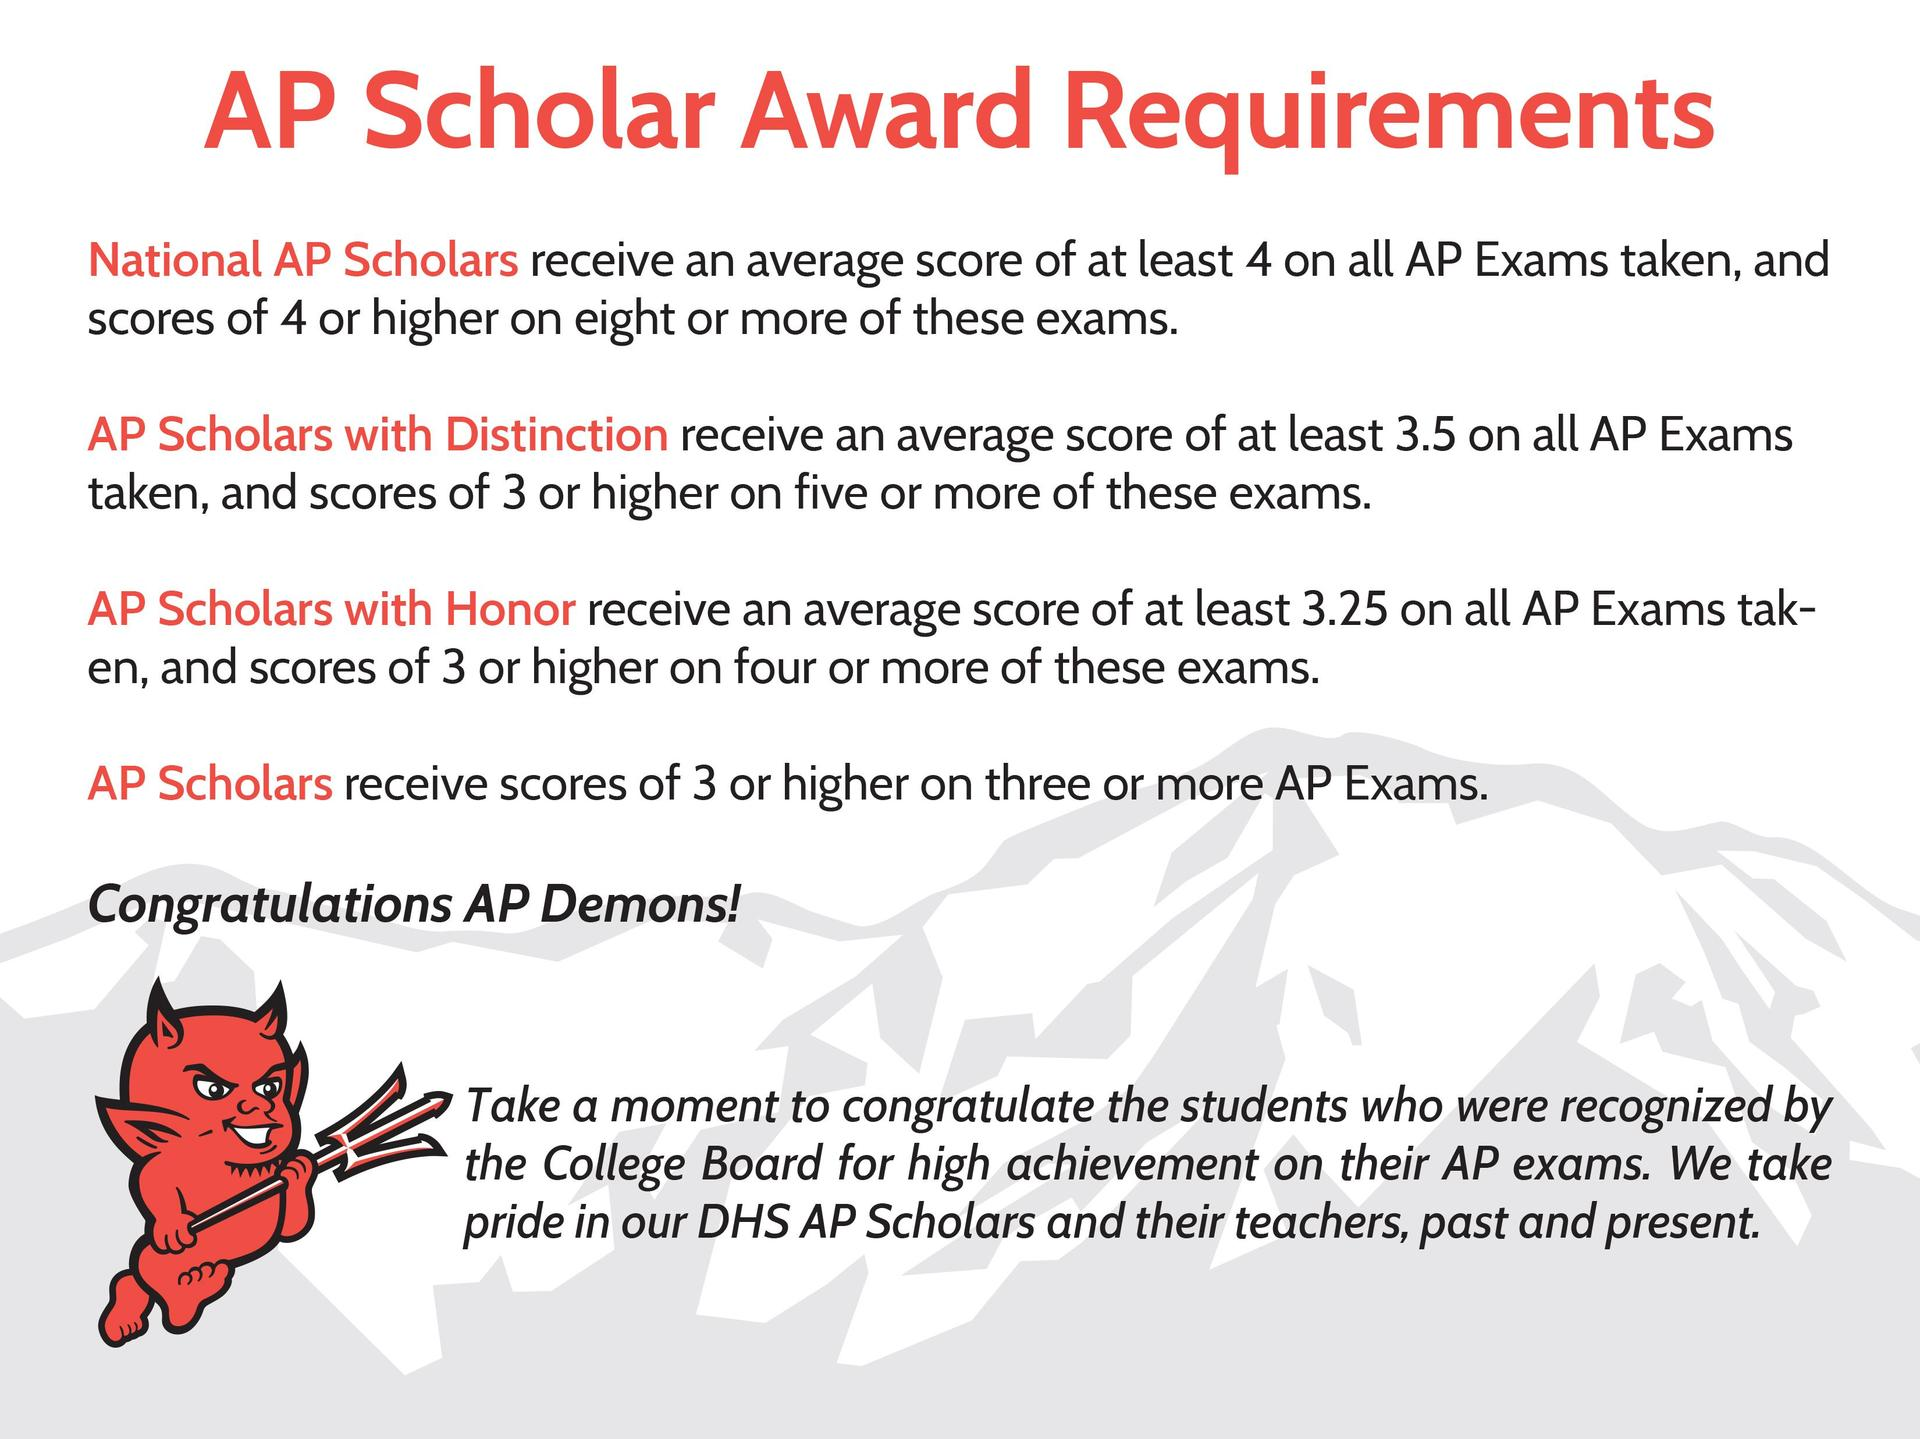 LIst of AP Scholar Requirements